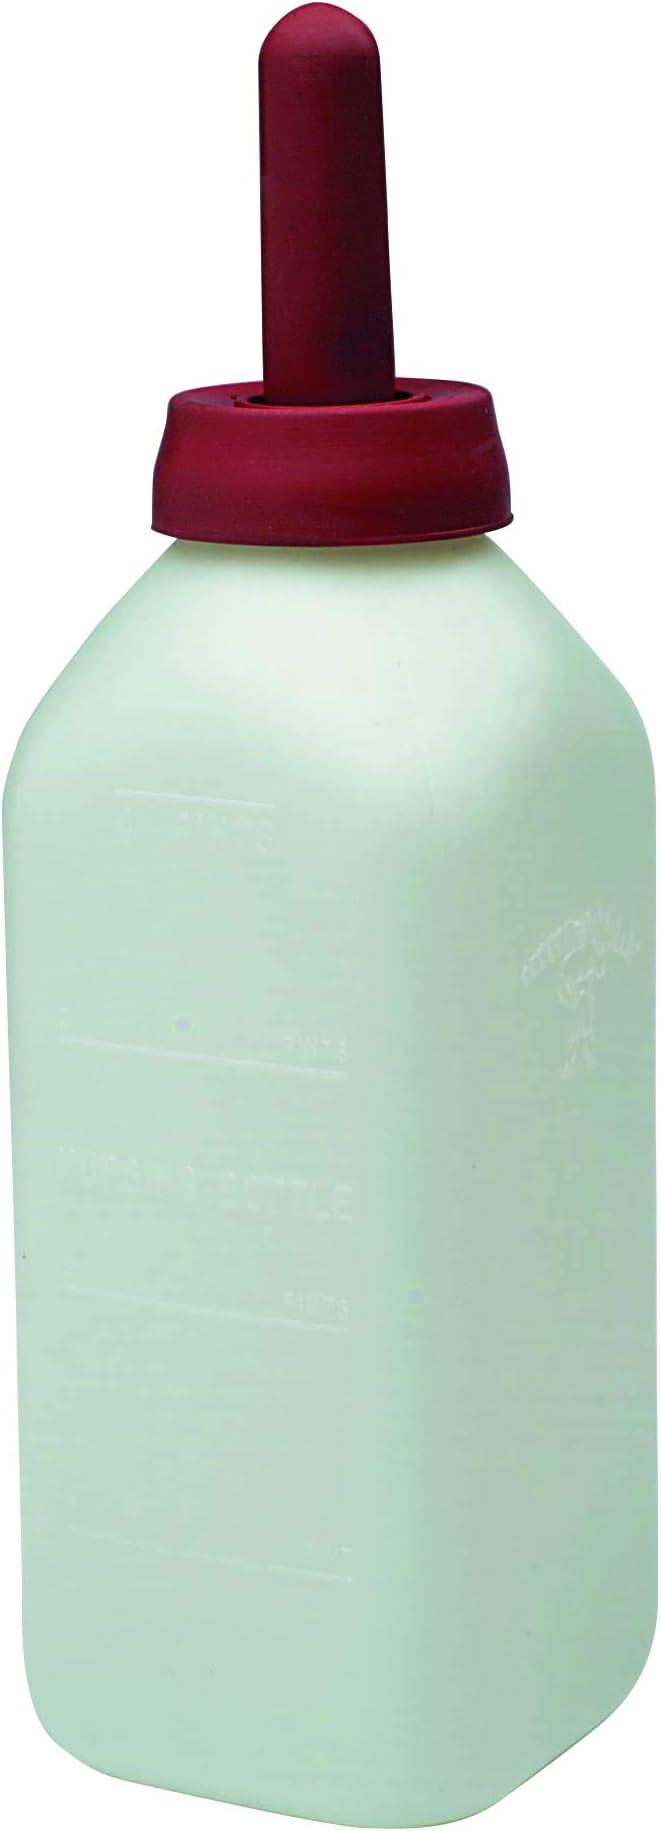 E-Z Nurse Feeding Supplies 2 quart Screw-On Calf Nursing Set of Bottle with Nipple /& Cap Small